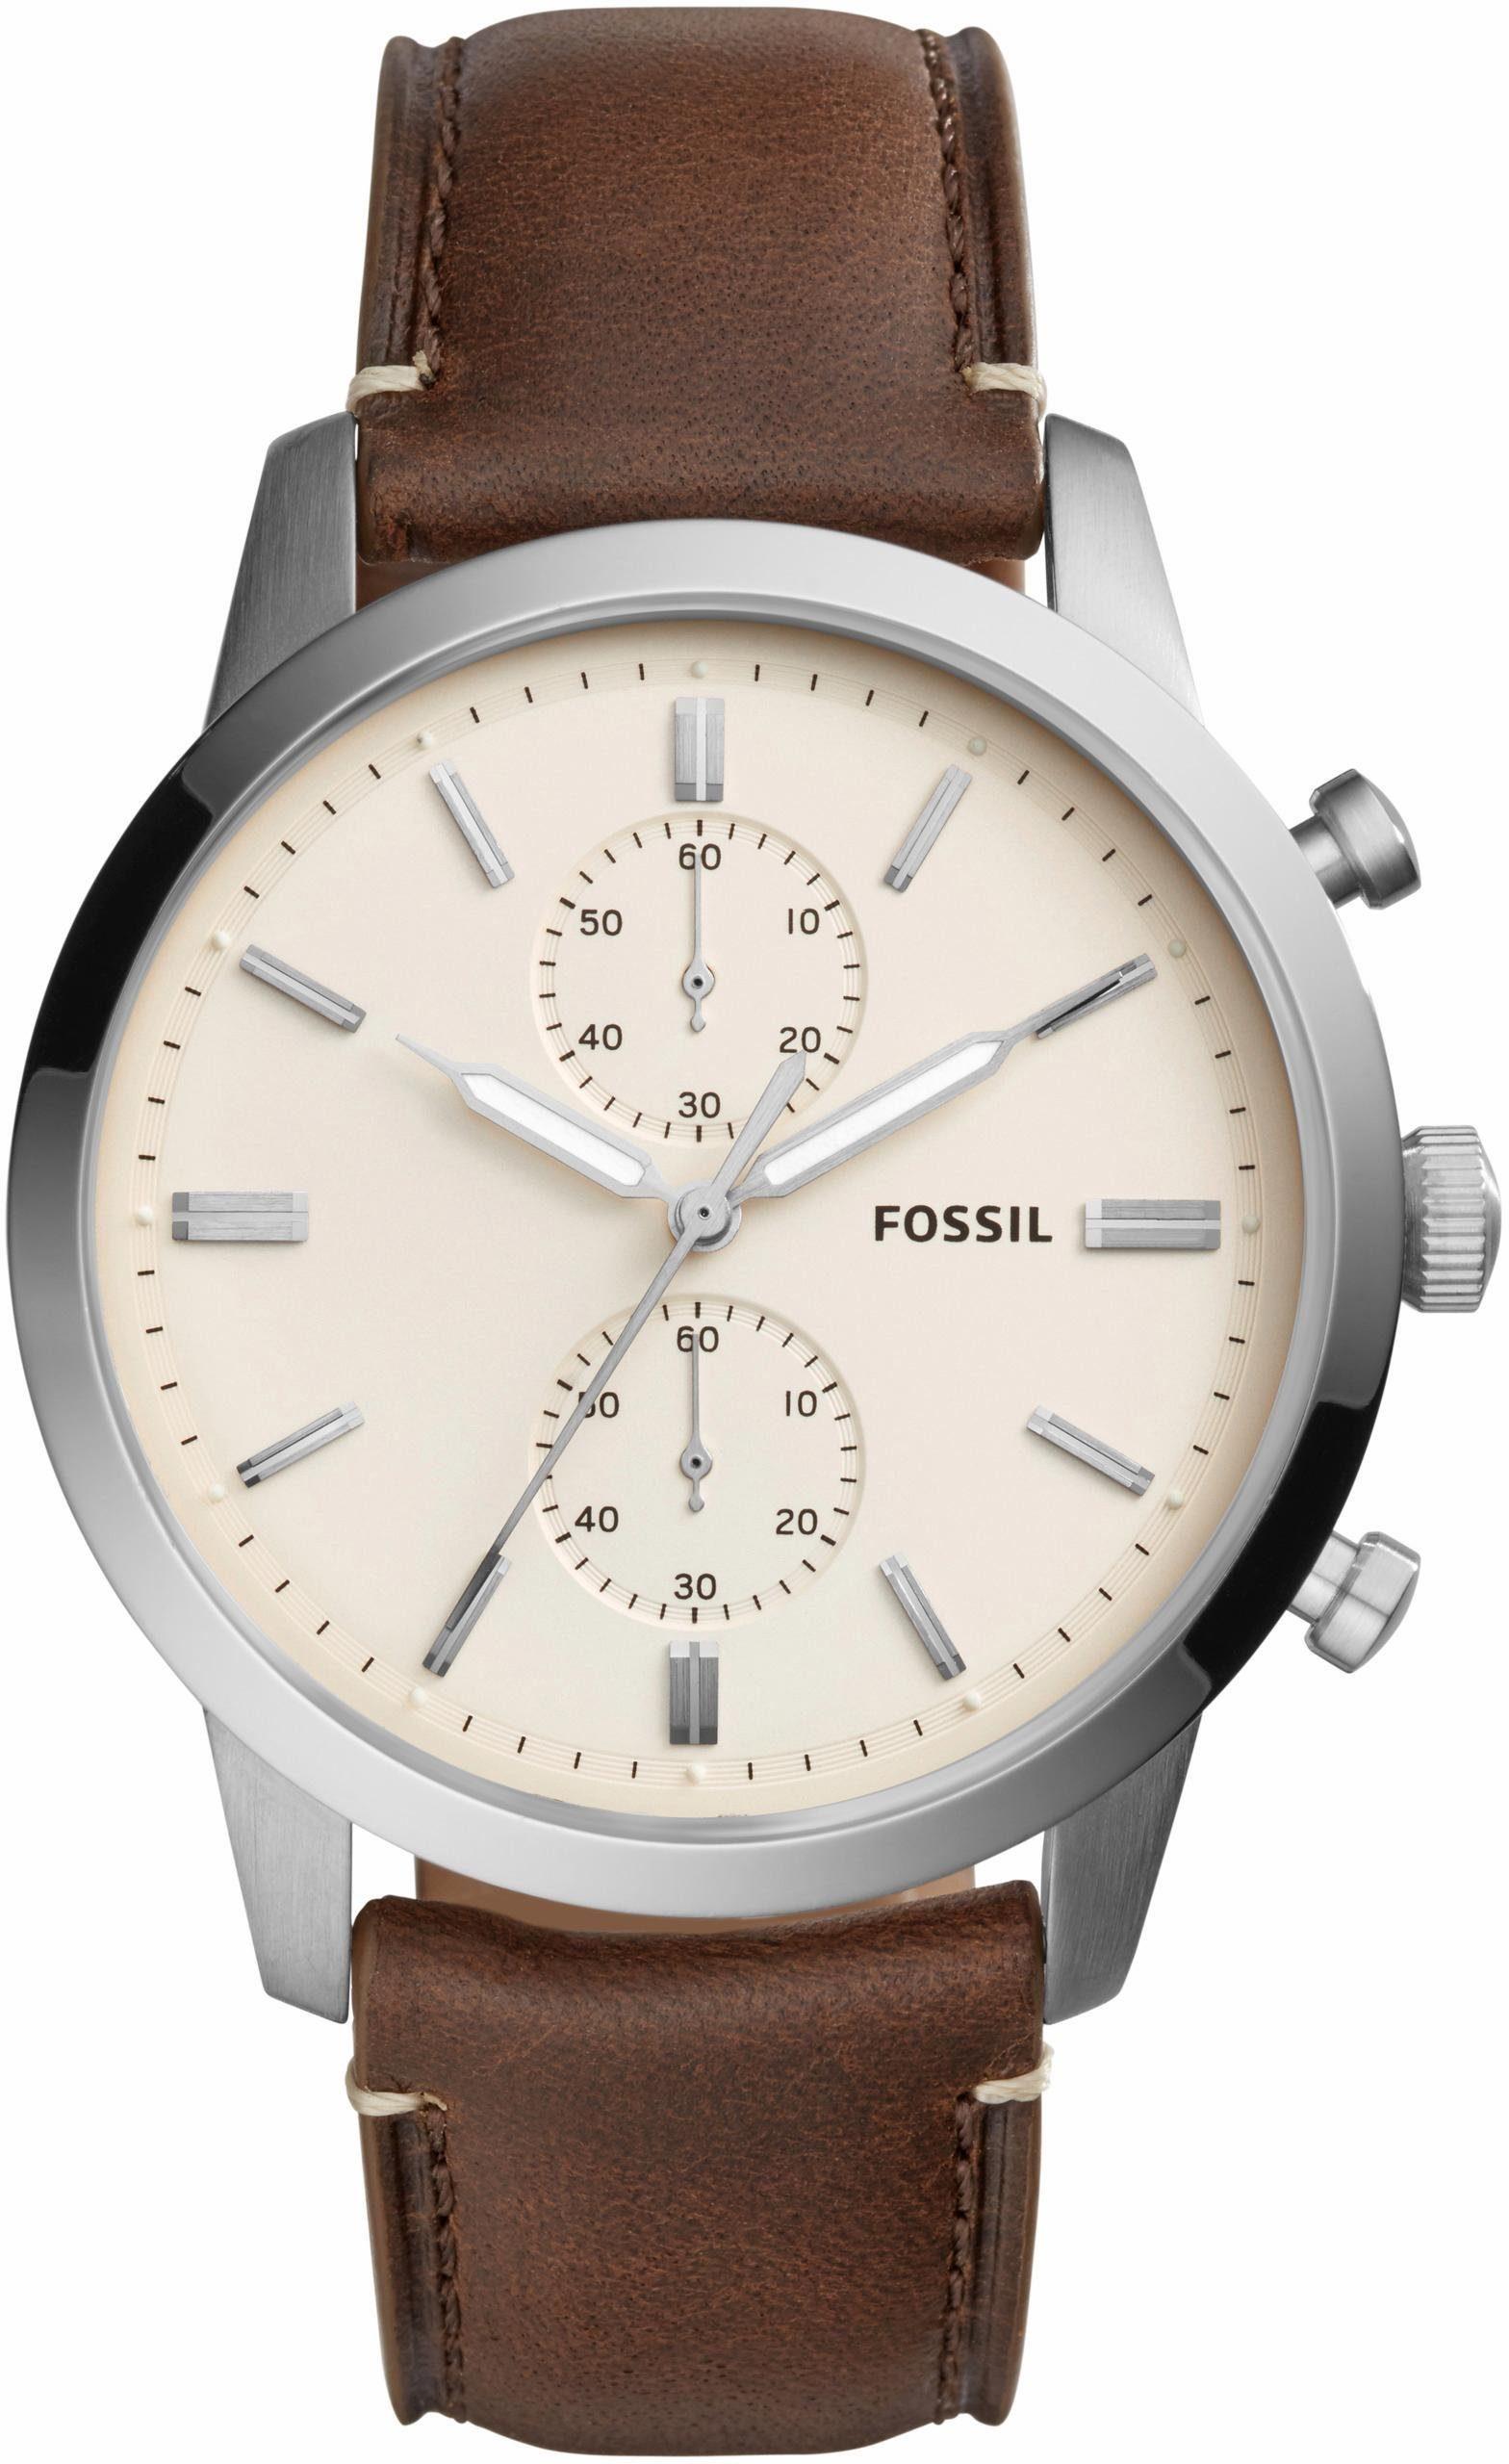 Fossil Chronograph »44 MM TOWNSMAN, FS5350«